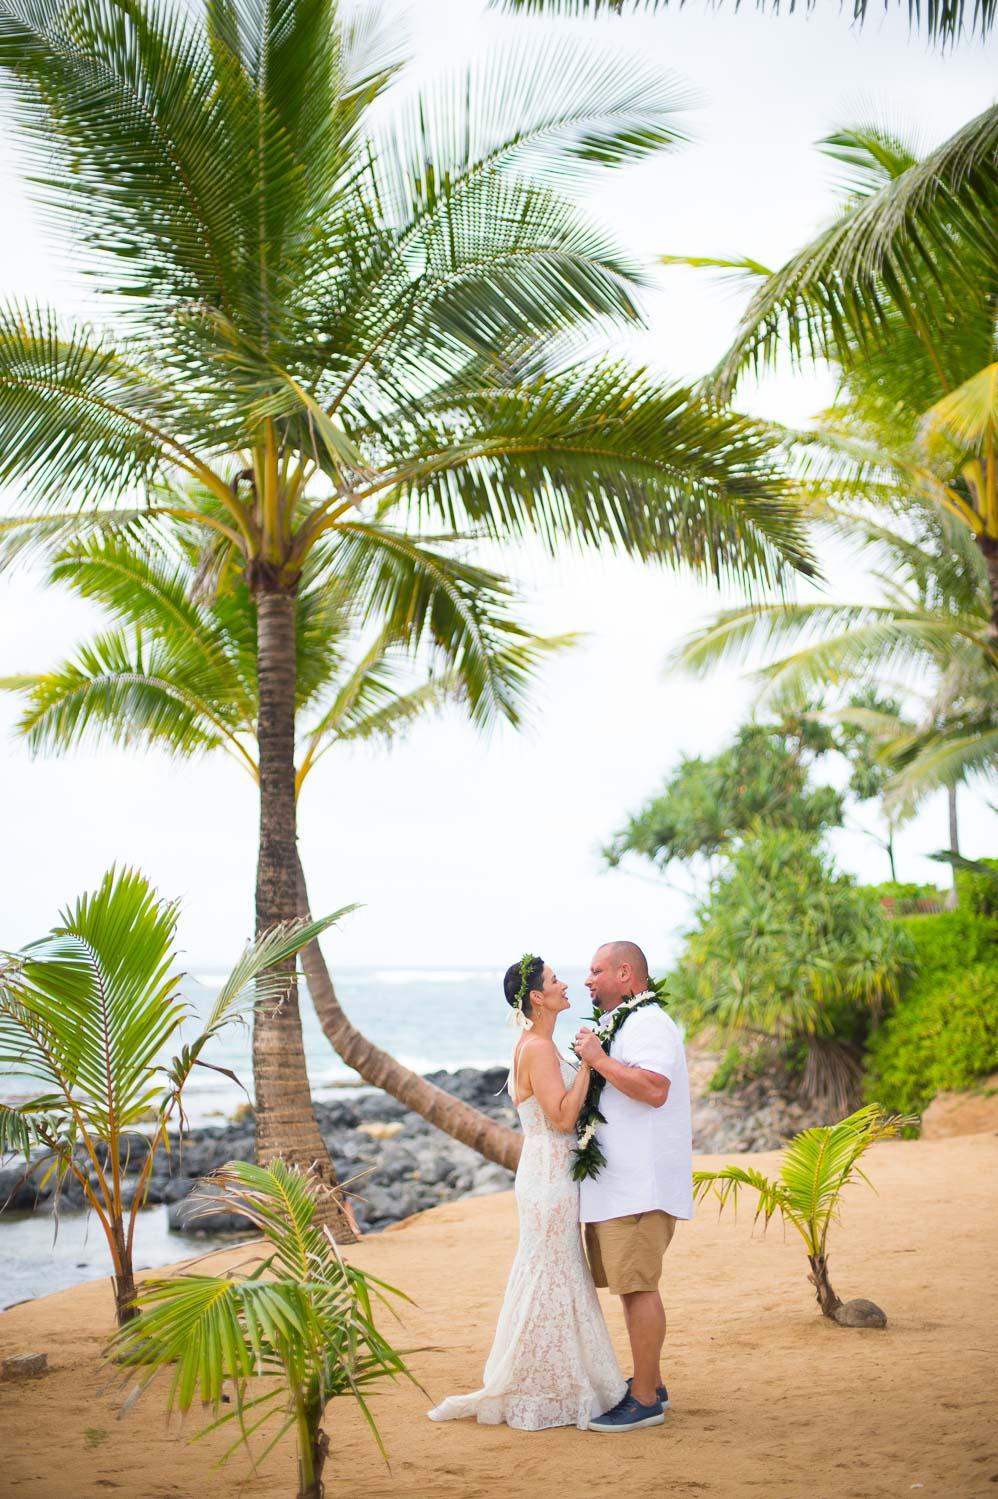 maui-wedding-photography-maui-wedding-venue-Tad-Craig-Photography-34-1.jpg